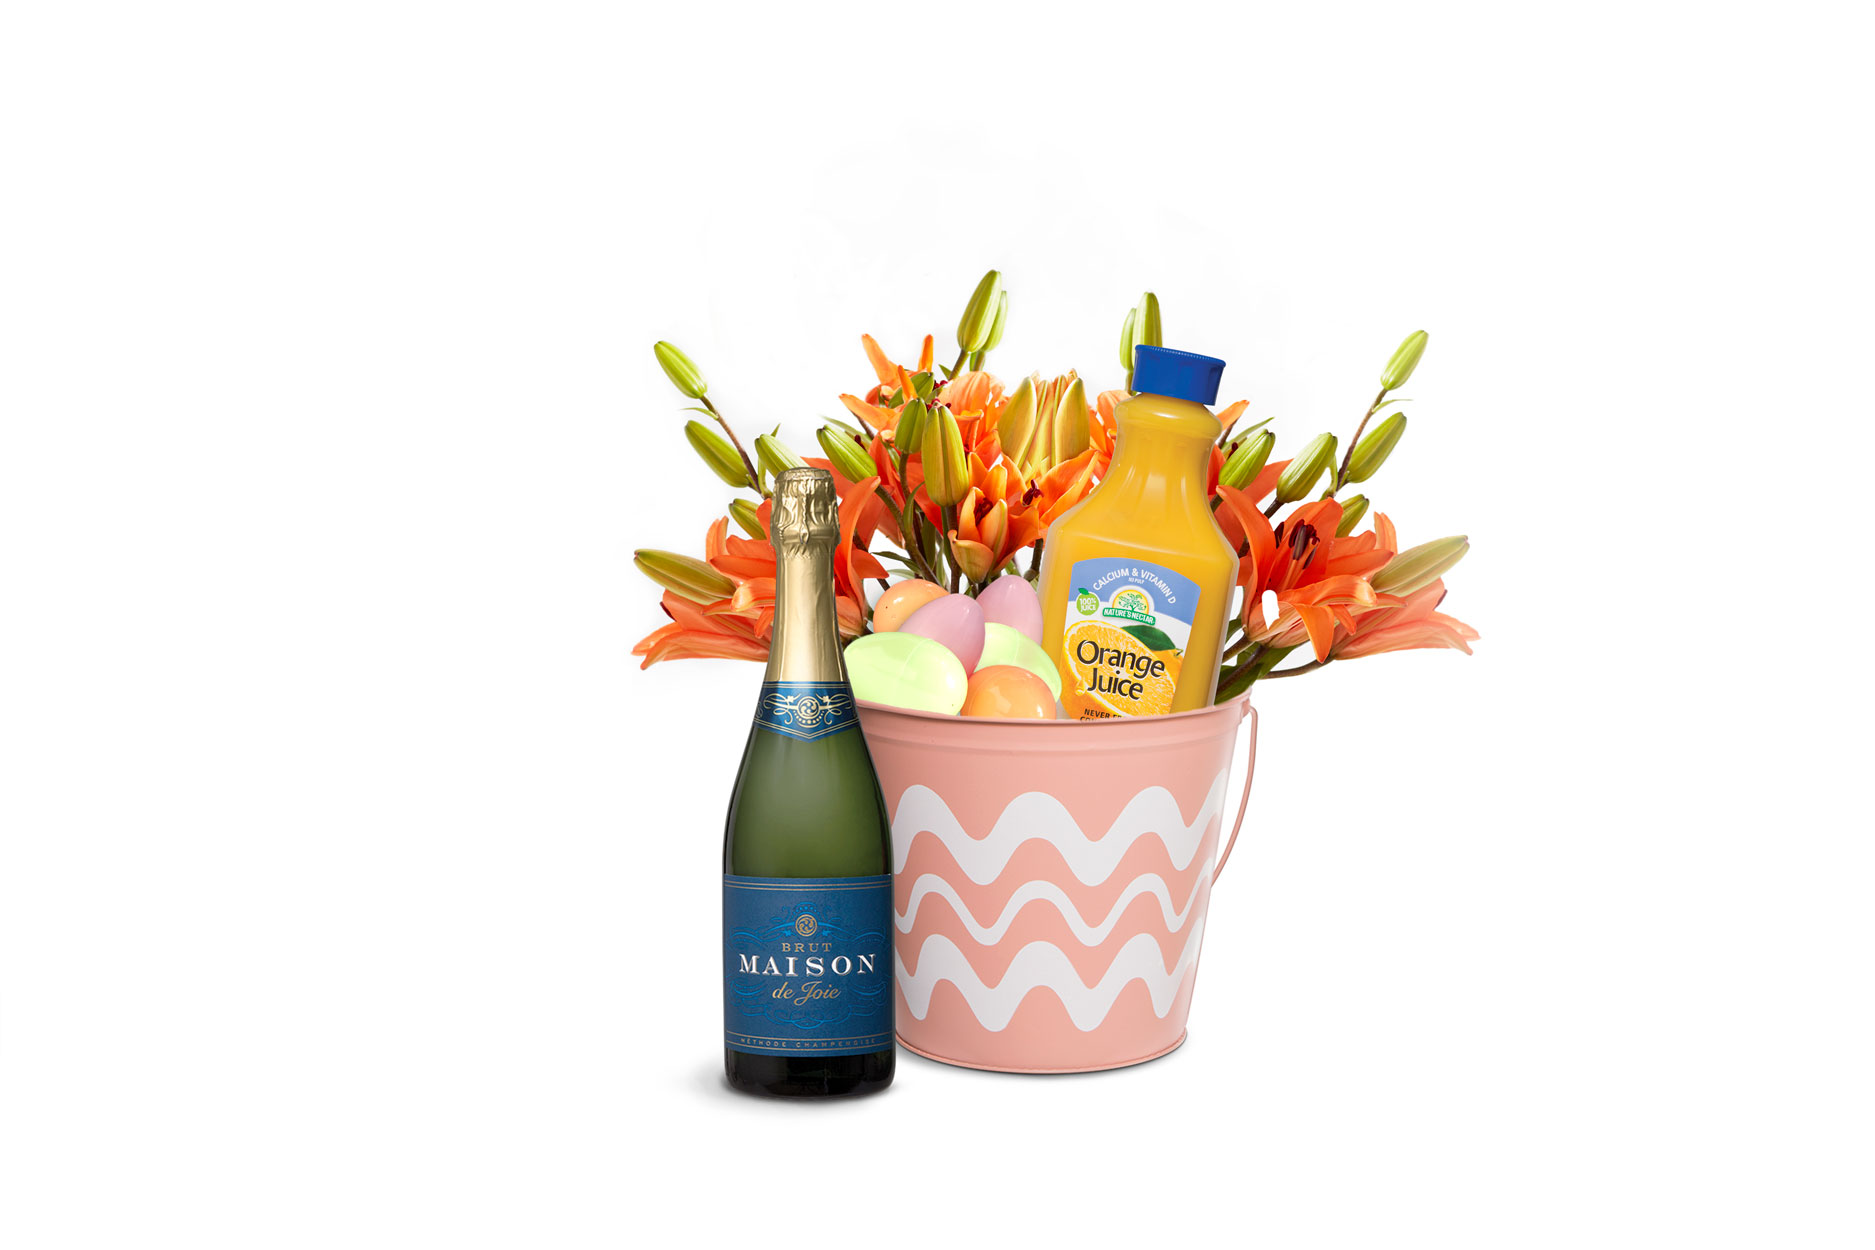 A brunch themed Easter basket with Maison de Joie Brut Sparkling, orange juice, and flowers.